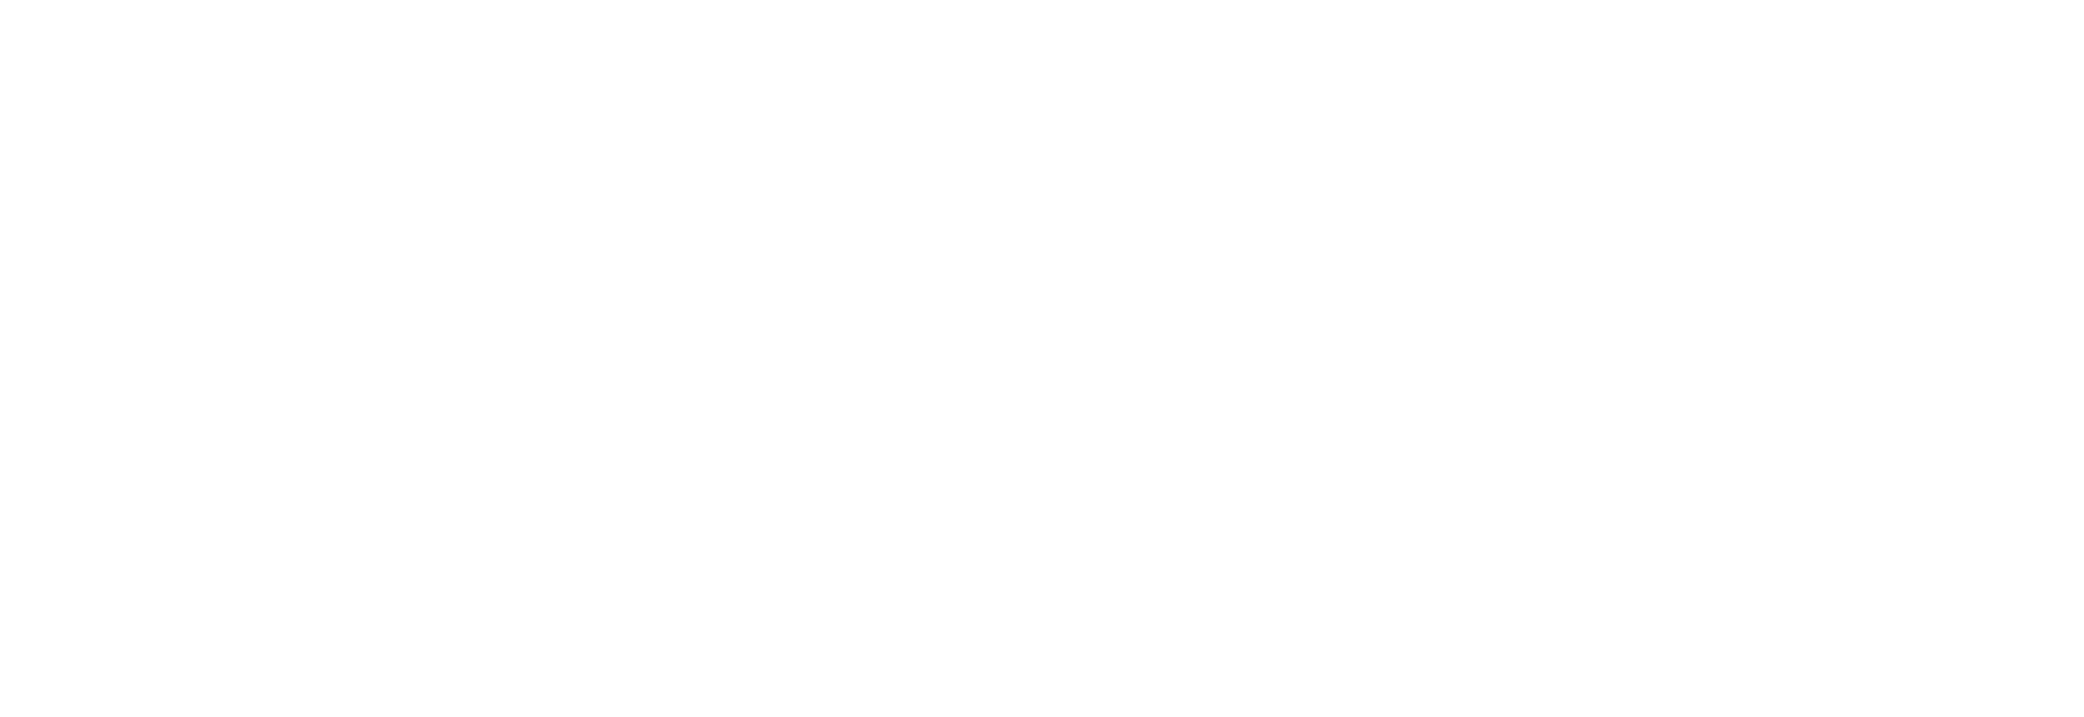 Hippocratic Adventures